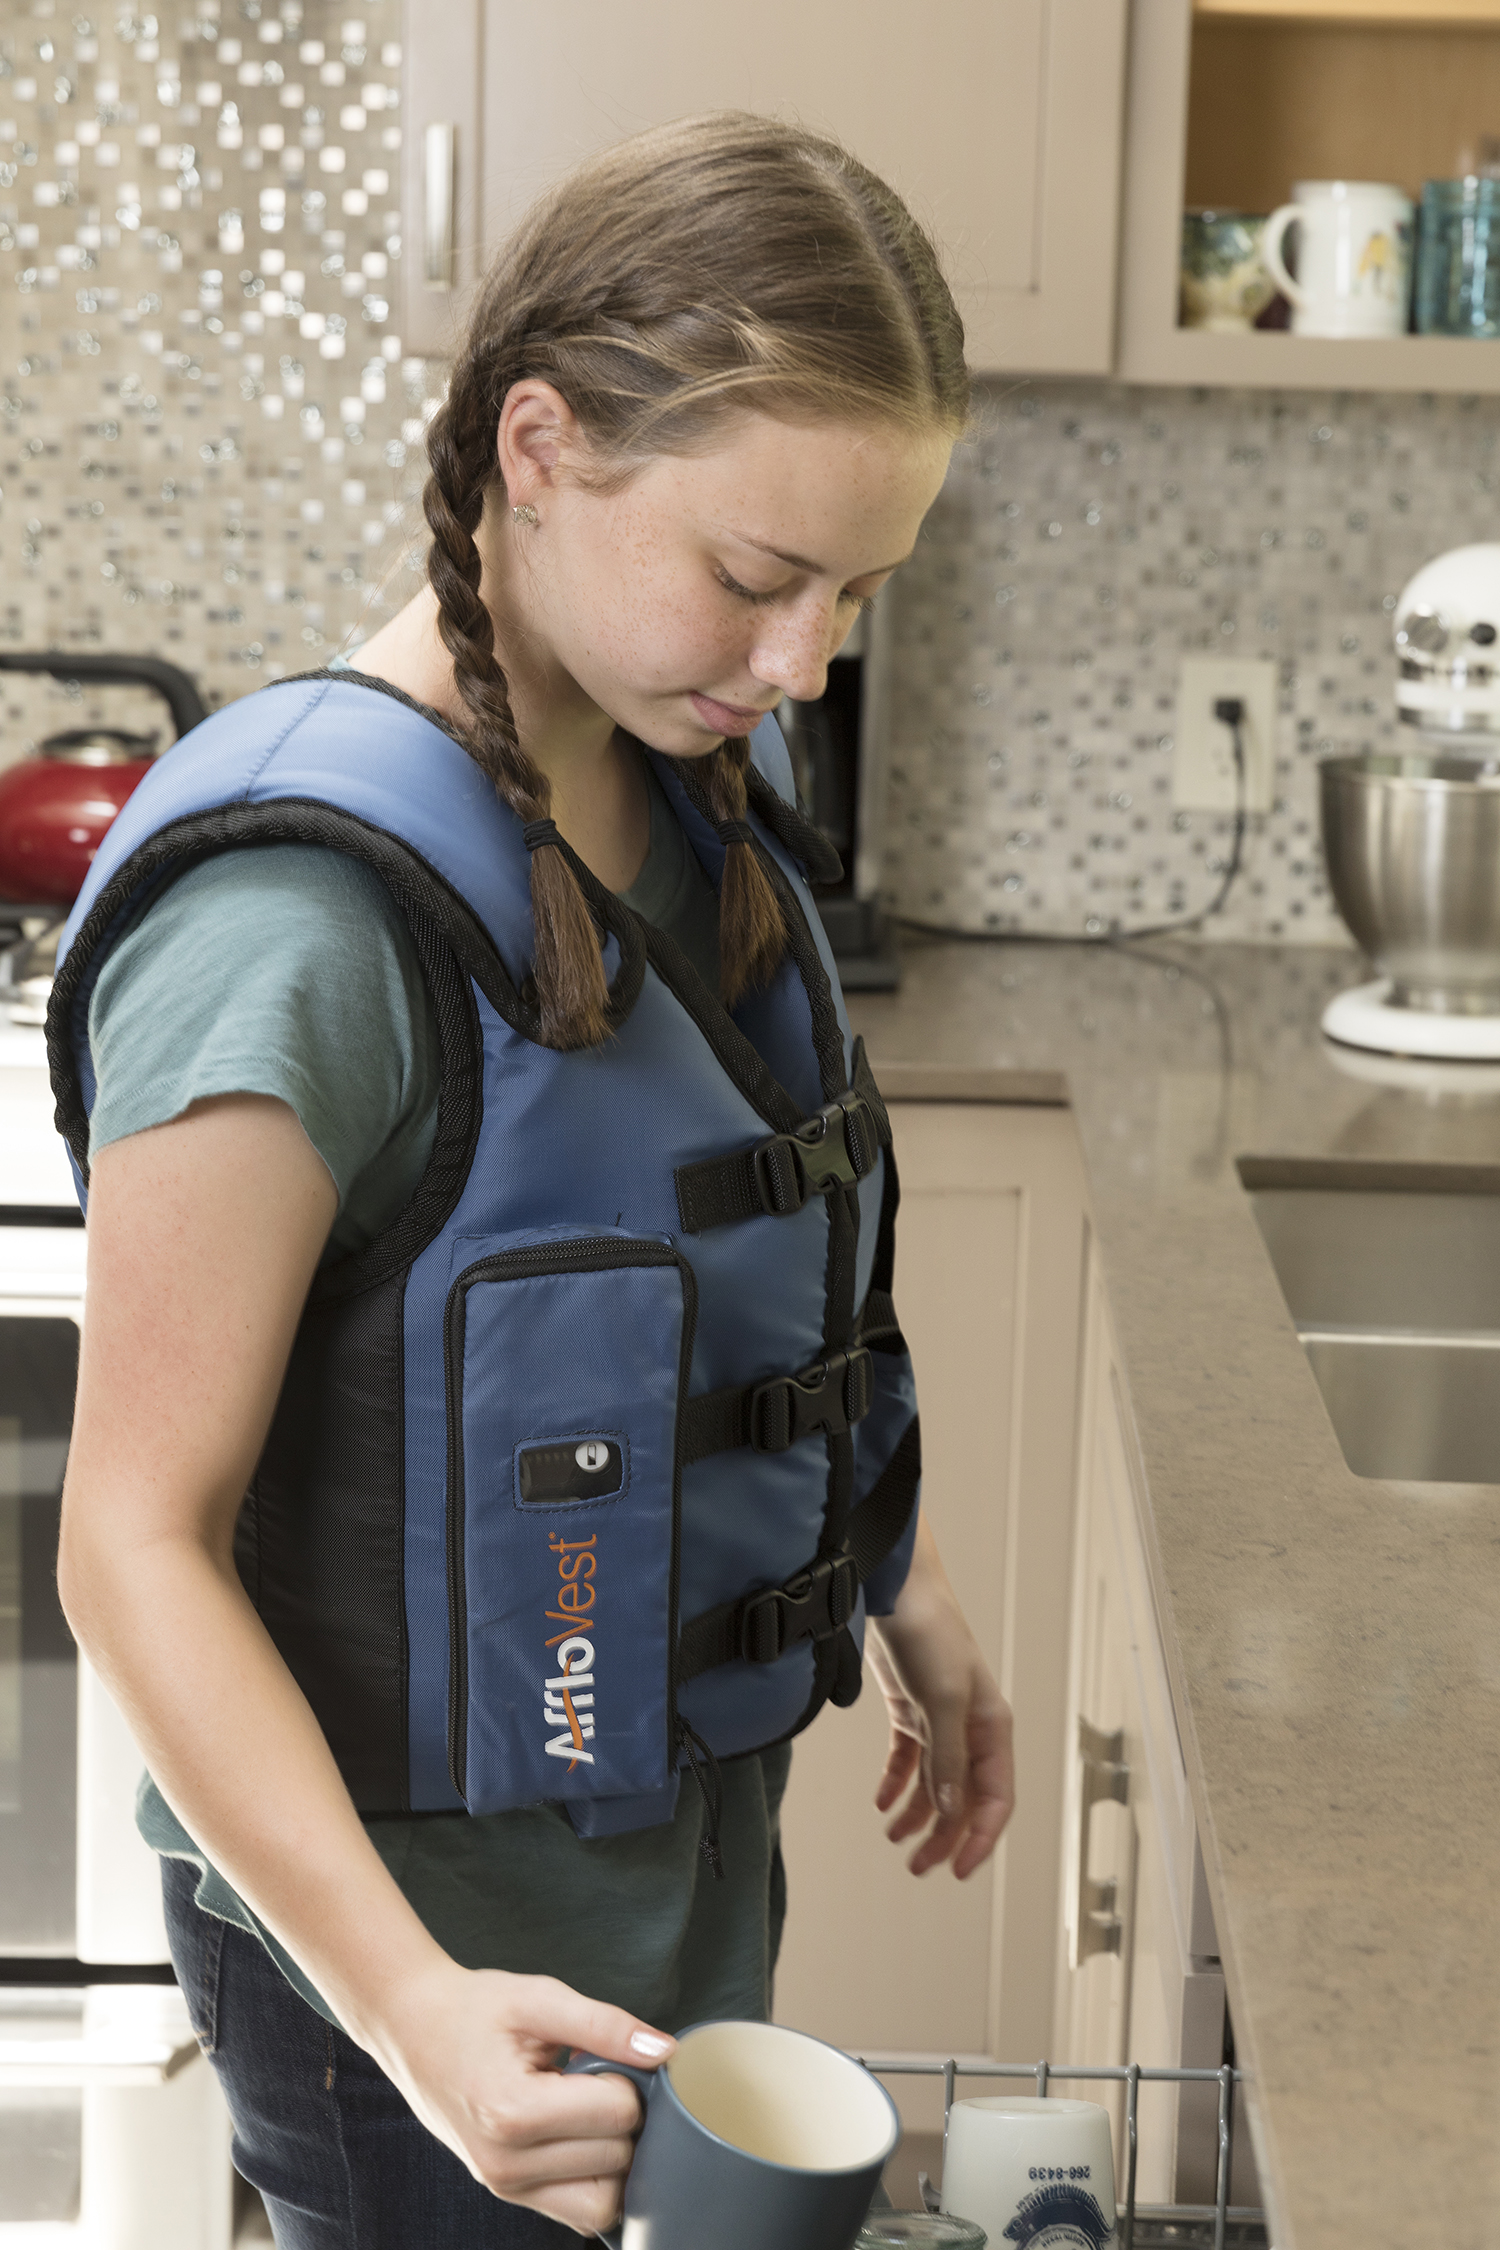 afflo-girl-dishwasher.jpg